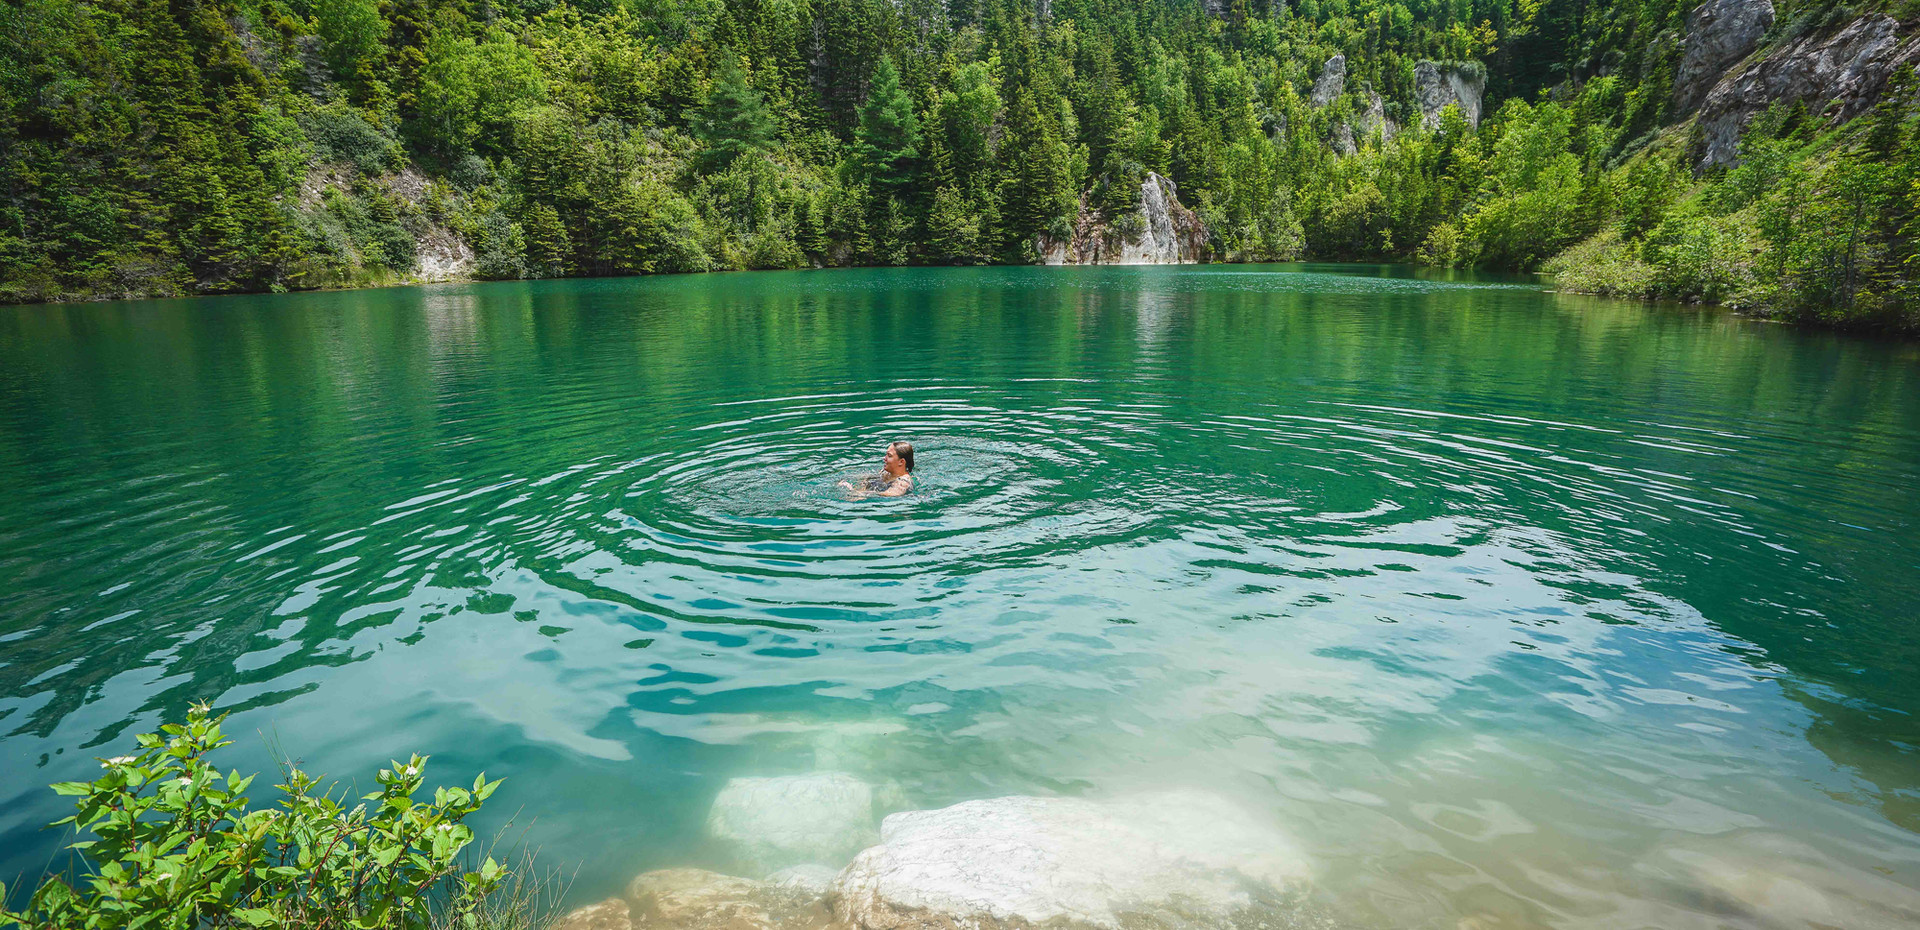 Swim in an abandoned gypsum mine